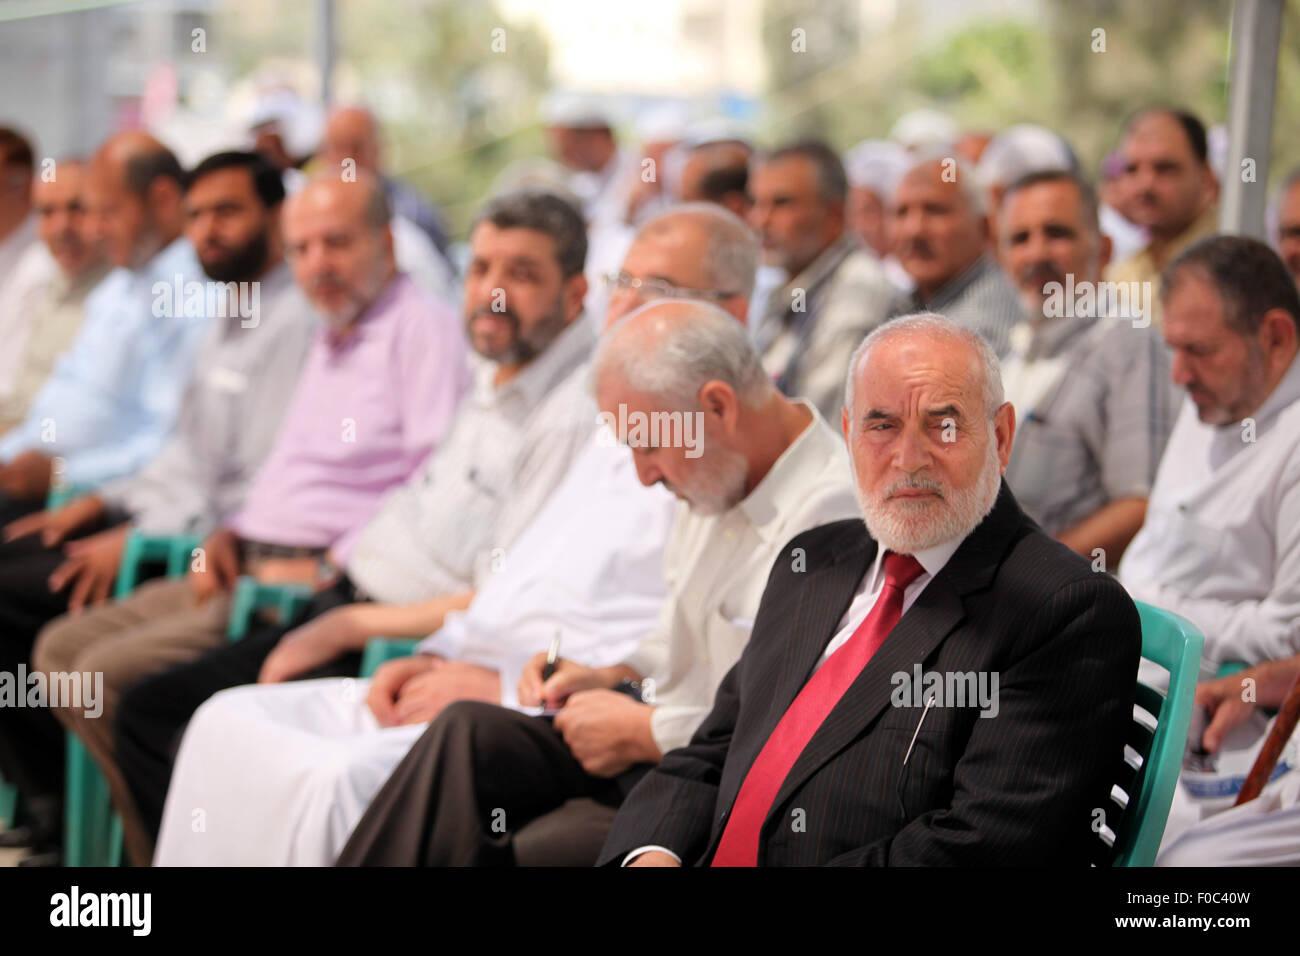 Gaza City, Gaza Strip, Palestinian Territory. 12th Aug, 2015. Palestinian members of the Legislative Council, take - Stock Image